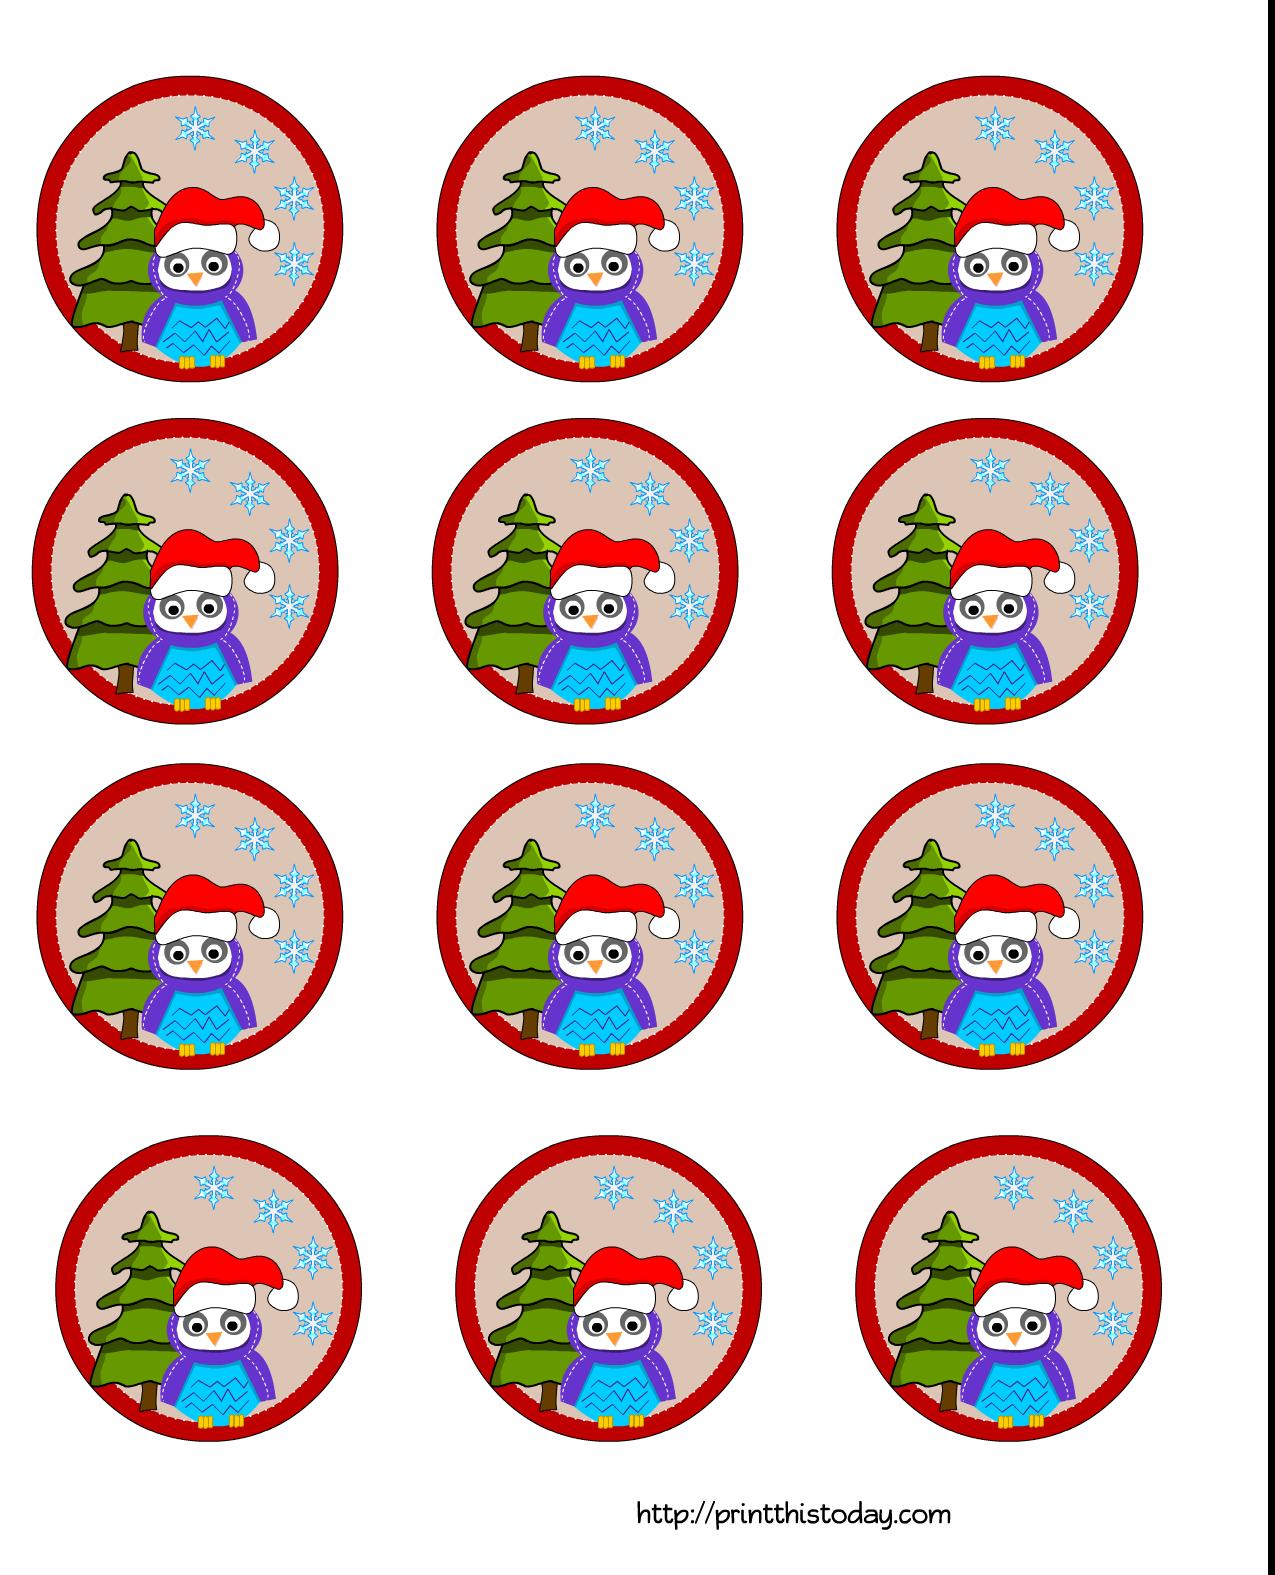 Christmas Tree Cake Topper Template